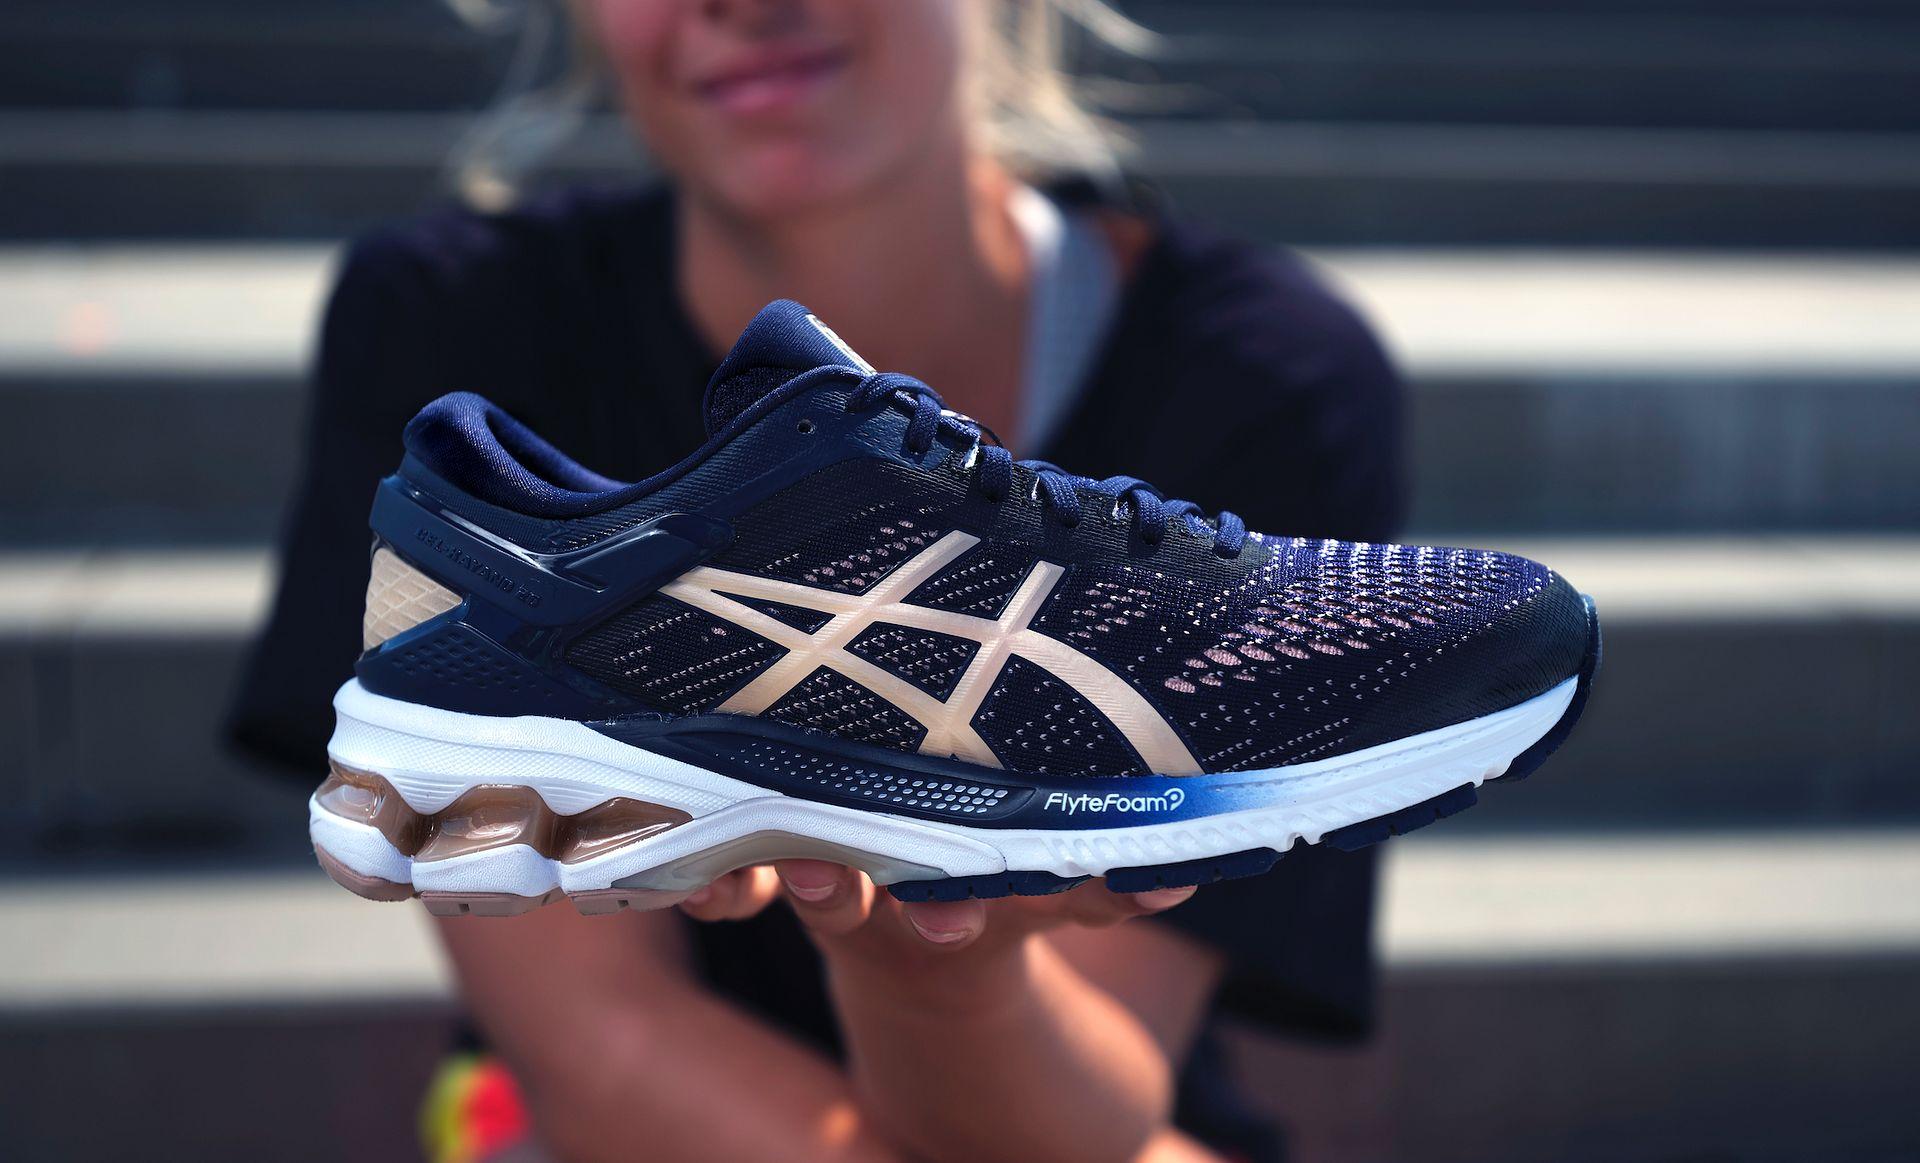 Asics-Gel-Kayano-26 +80 Most Inspiring Workout Shoes Ideas for Women